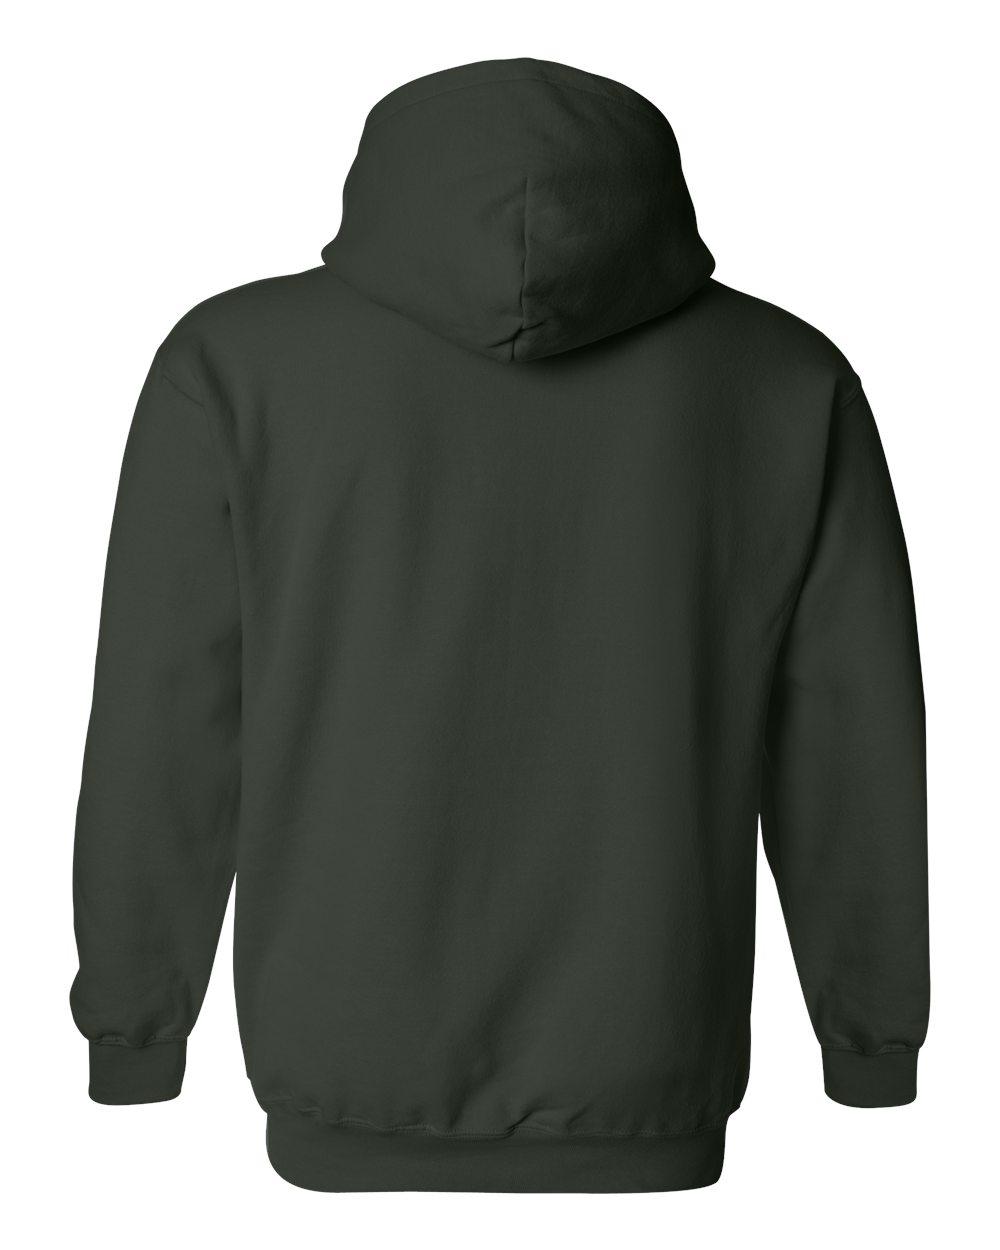 Gildan-Mens-Blank-Hoodie-Heavy-Blend-Hooded-Sweatshirt-Solid-18500-up-to-5XL thumbnail 28